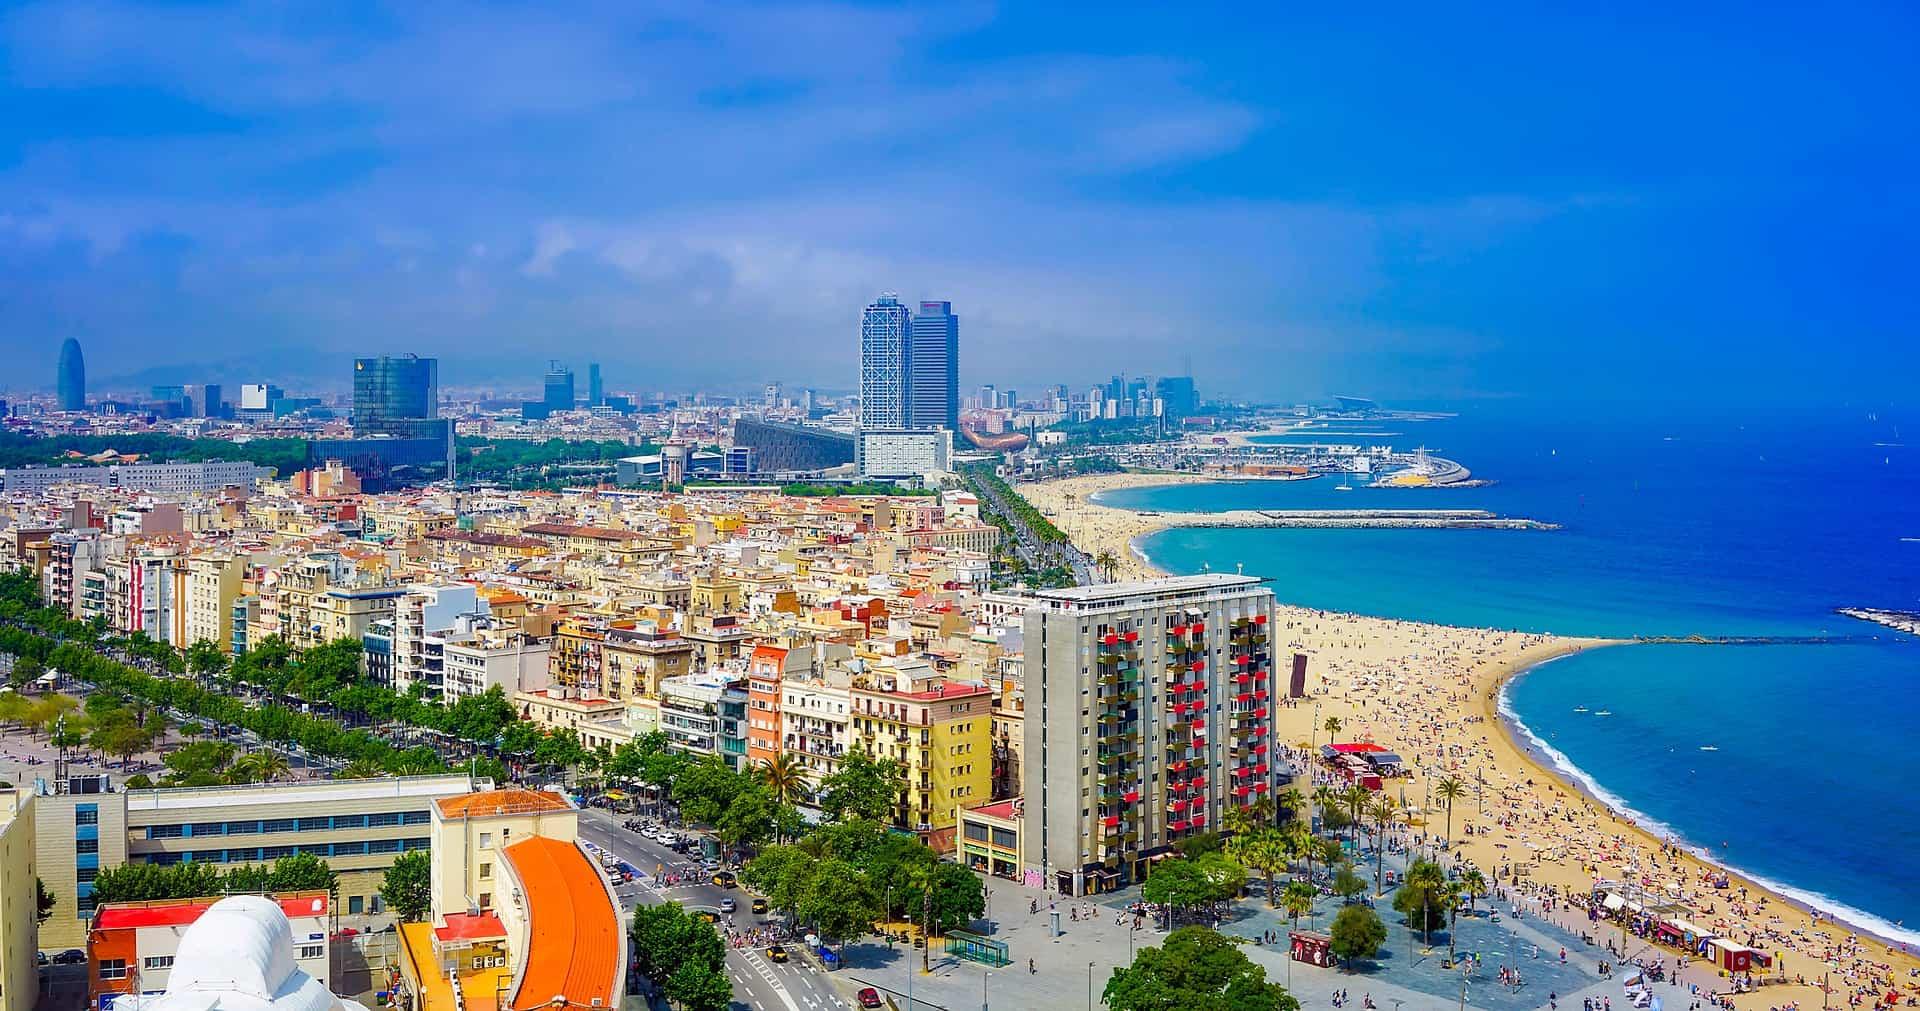 Nur 26,29€ - Atenea Valles Aparthotel 4 Sterne Barcelona - Granollers